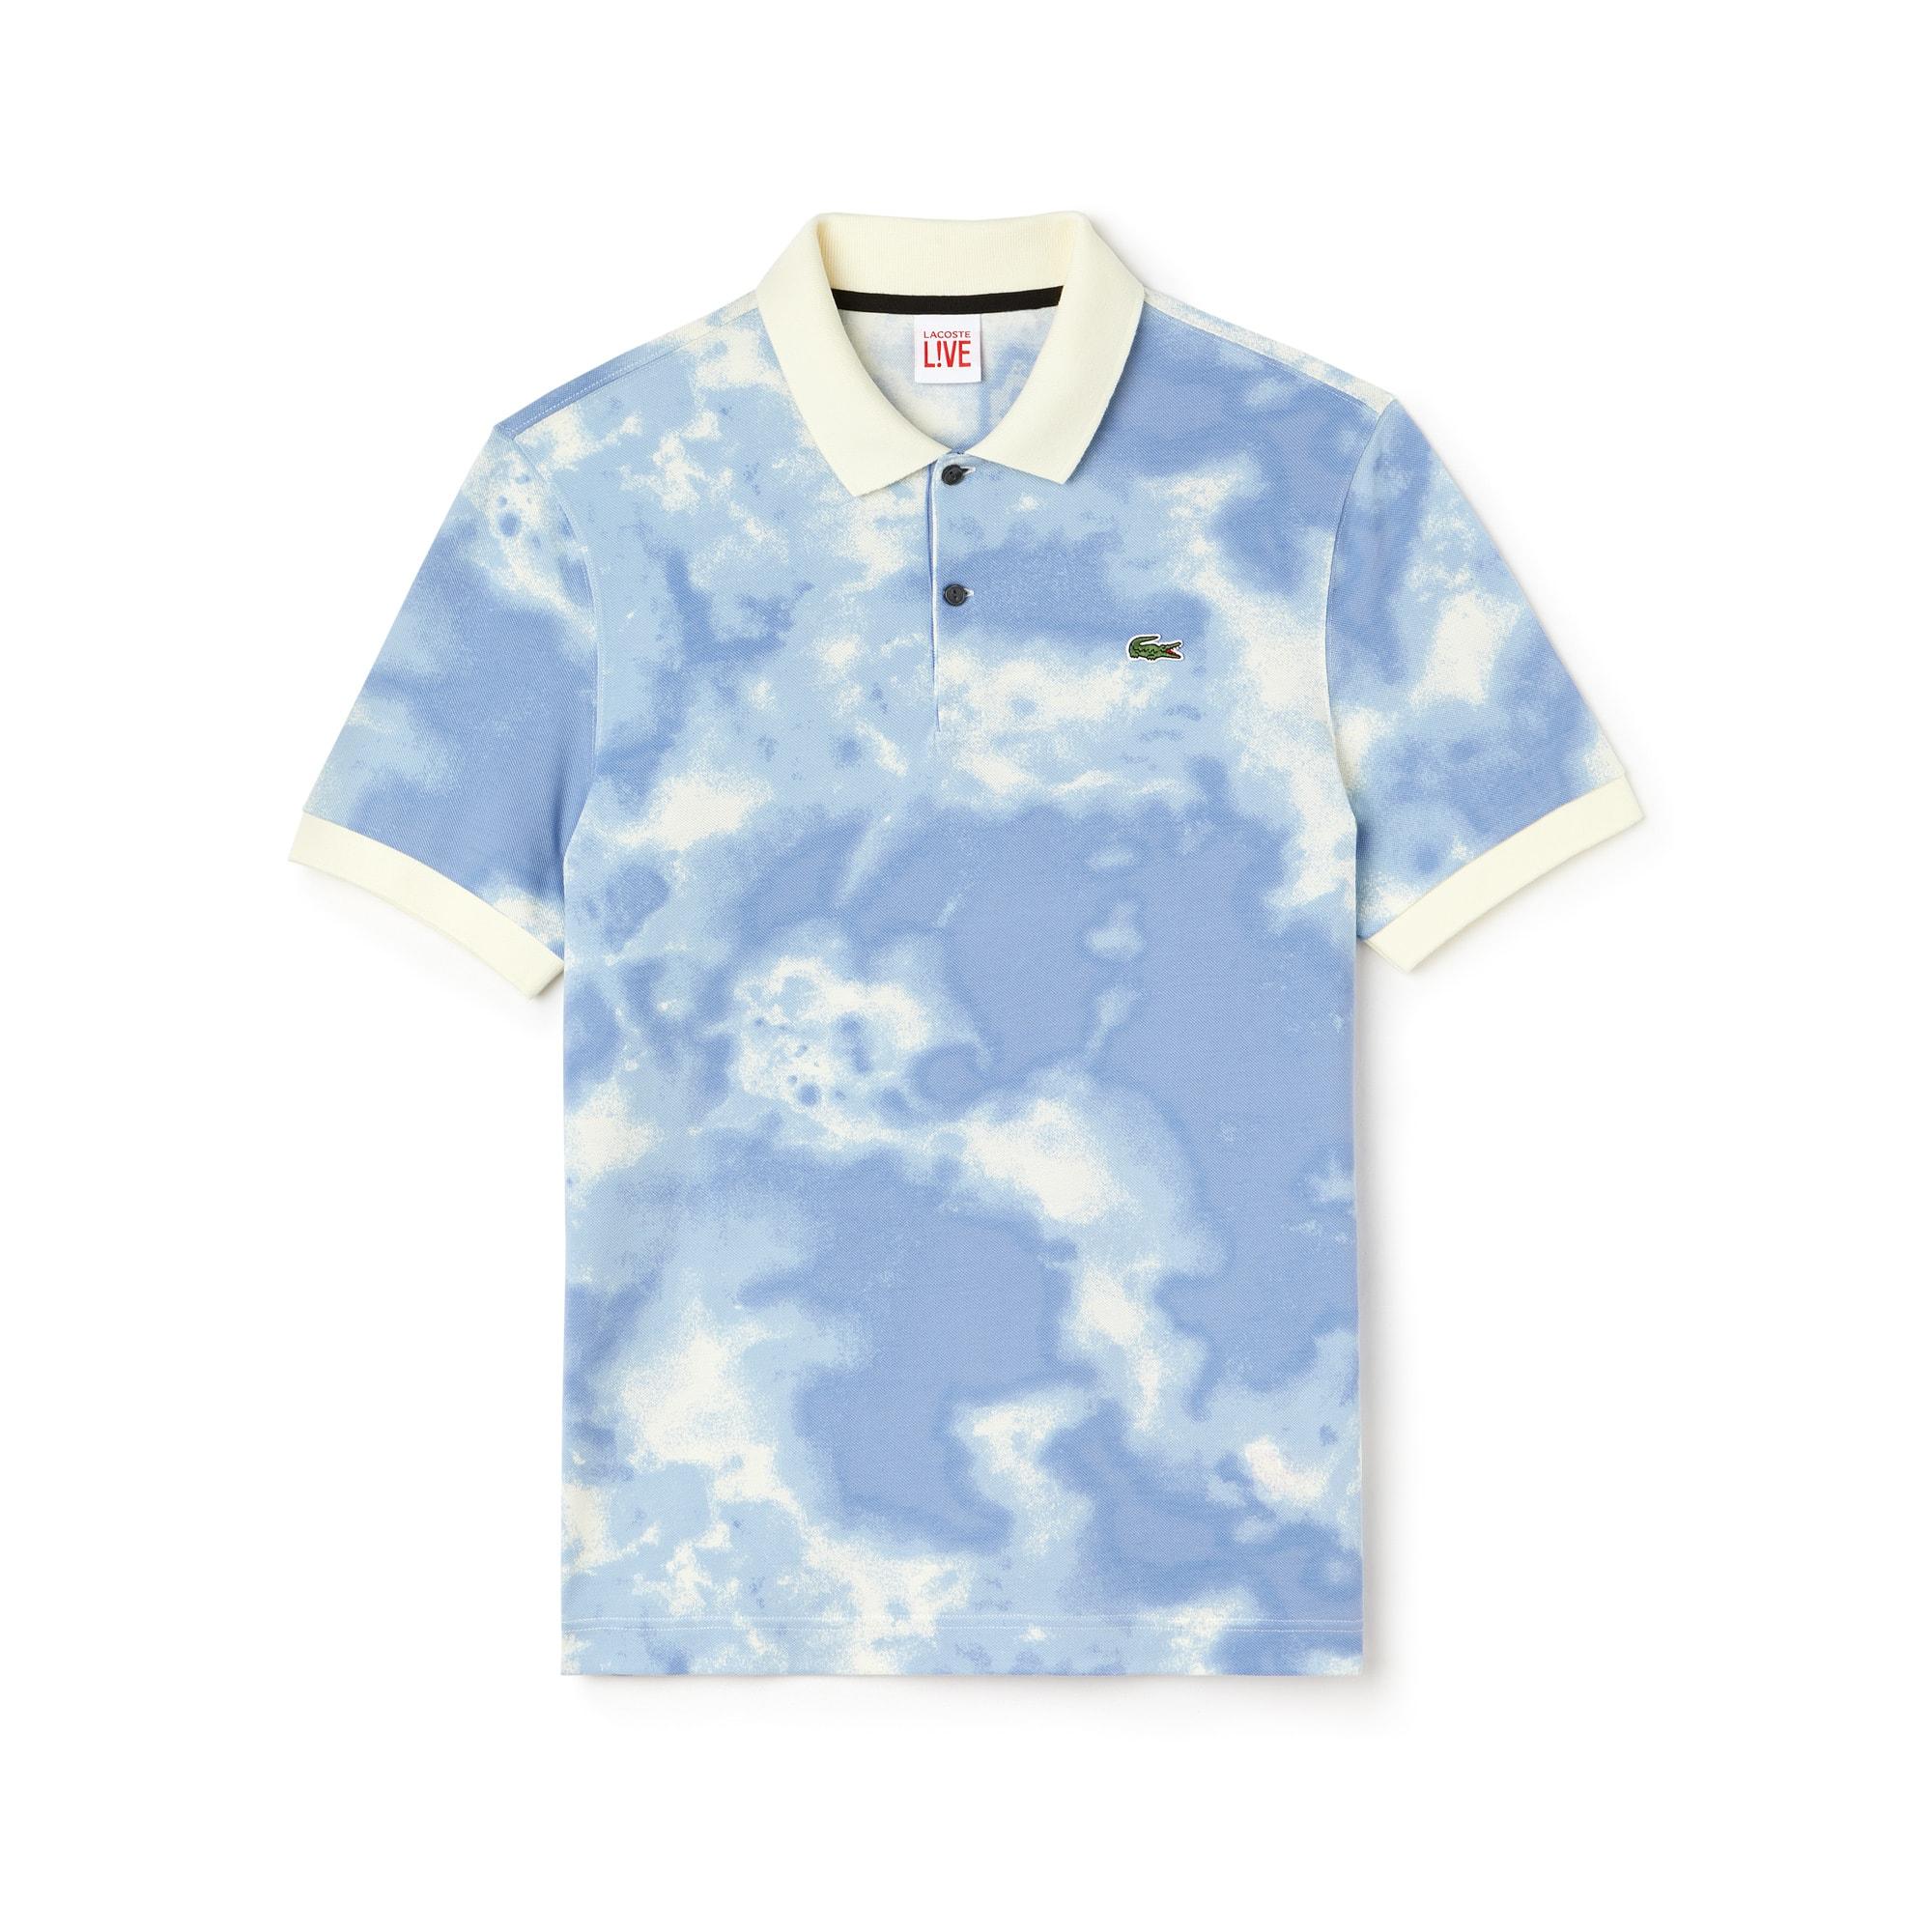 Herren LACOSTE L!VE Mini-Piqué Poloshirt mit Wolken-Print